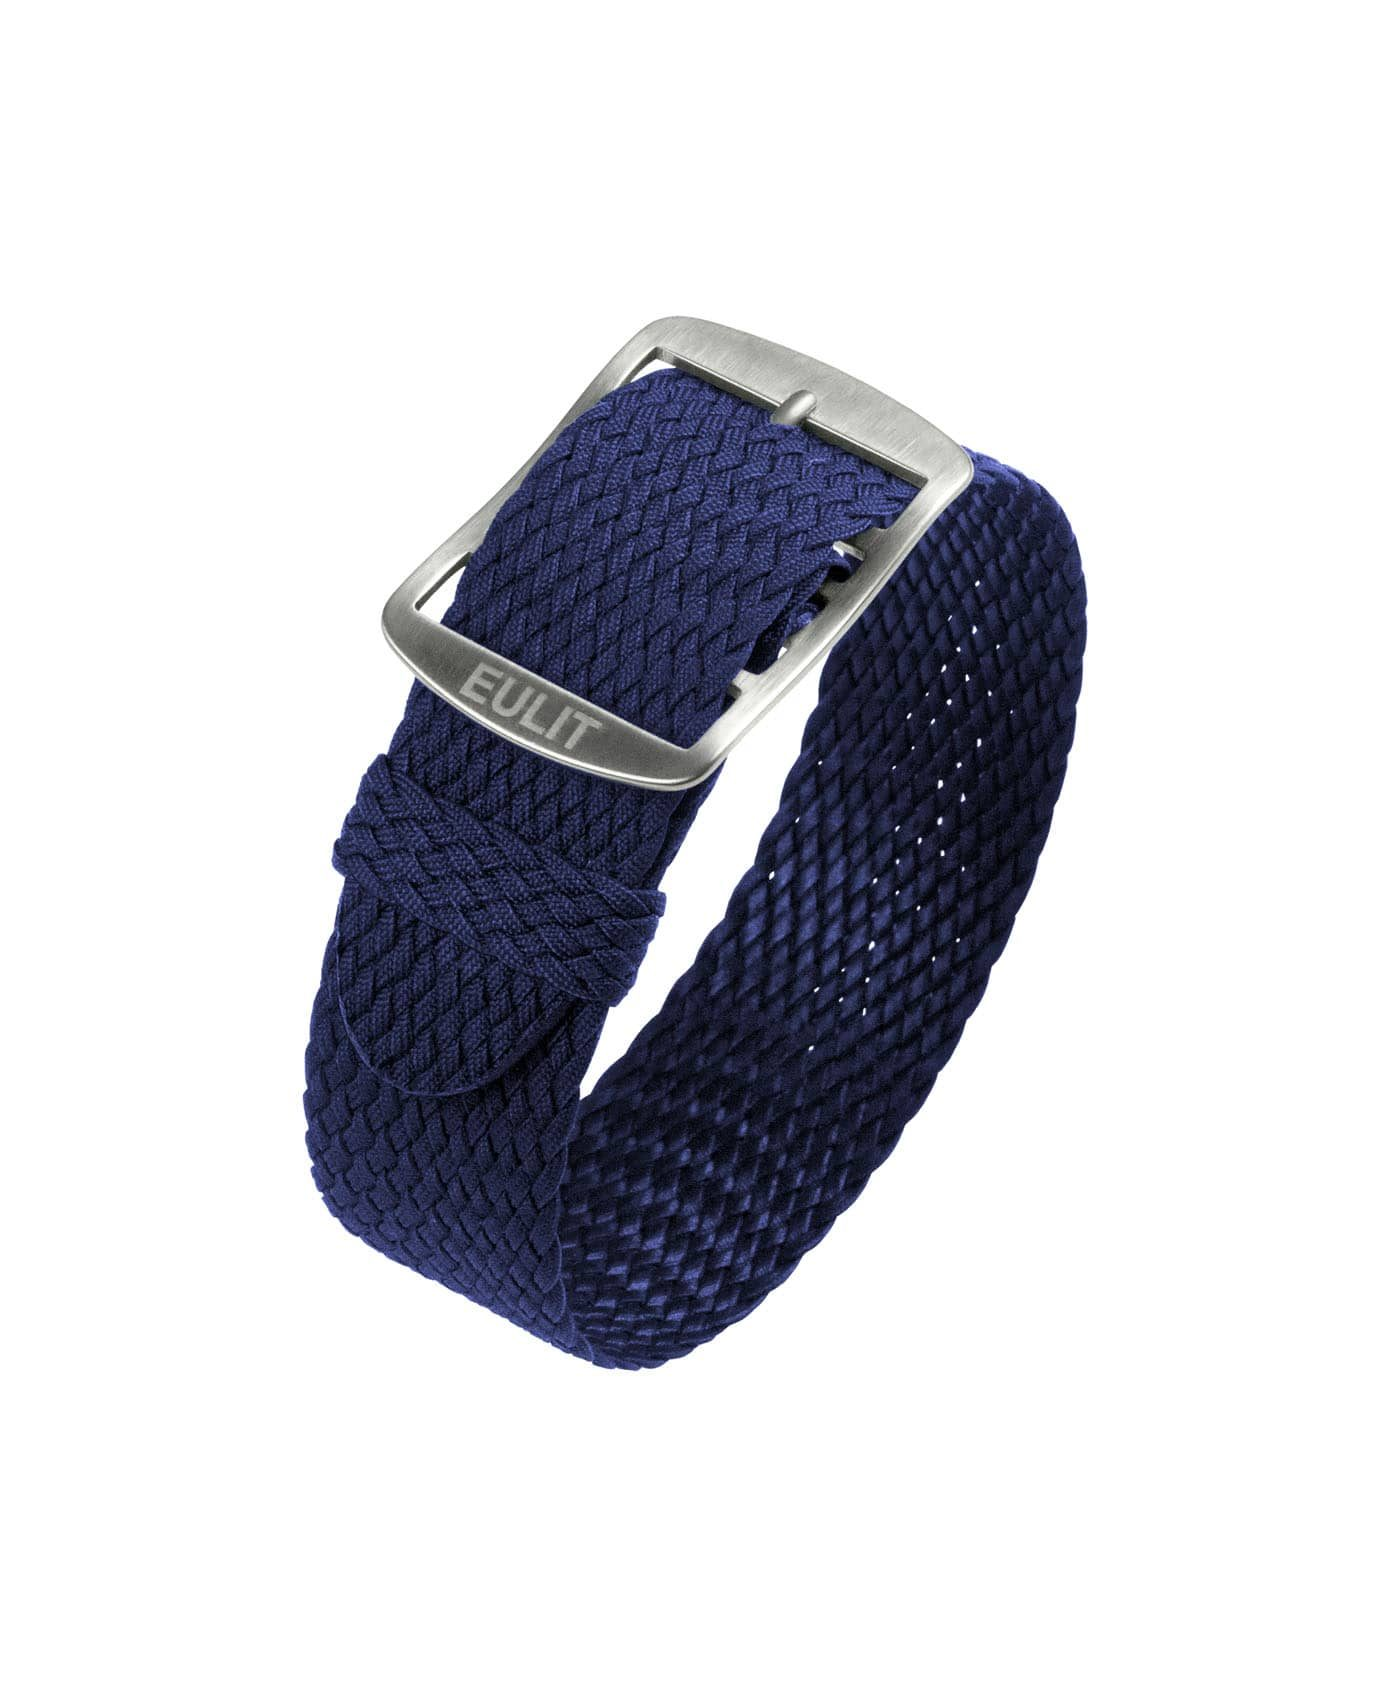 Eulit Baltic Perlon Watch Strap_Navy blue